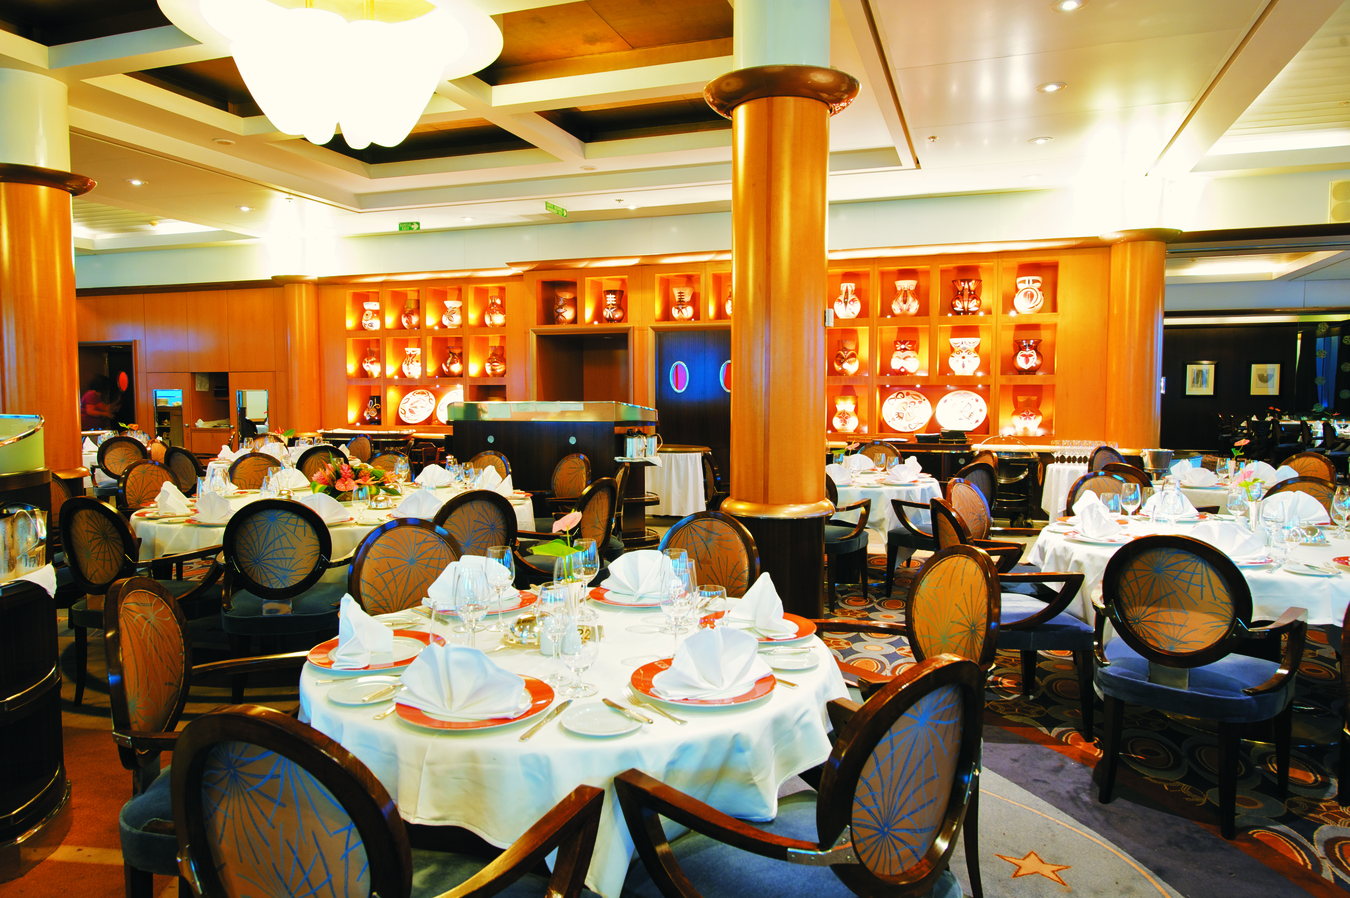 Paul Gauguin - Le Etoile Restaurant